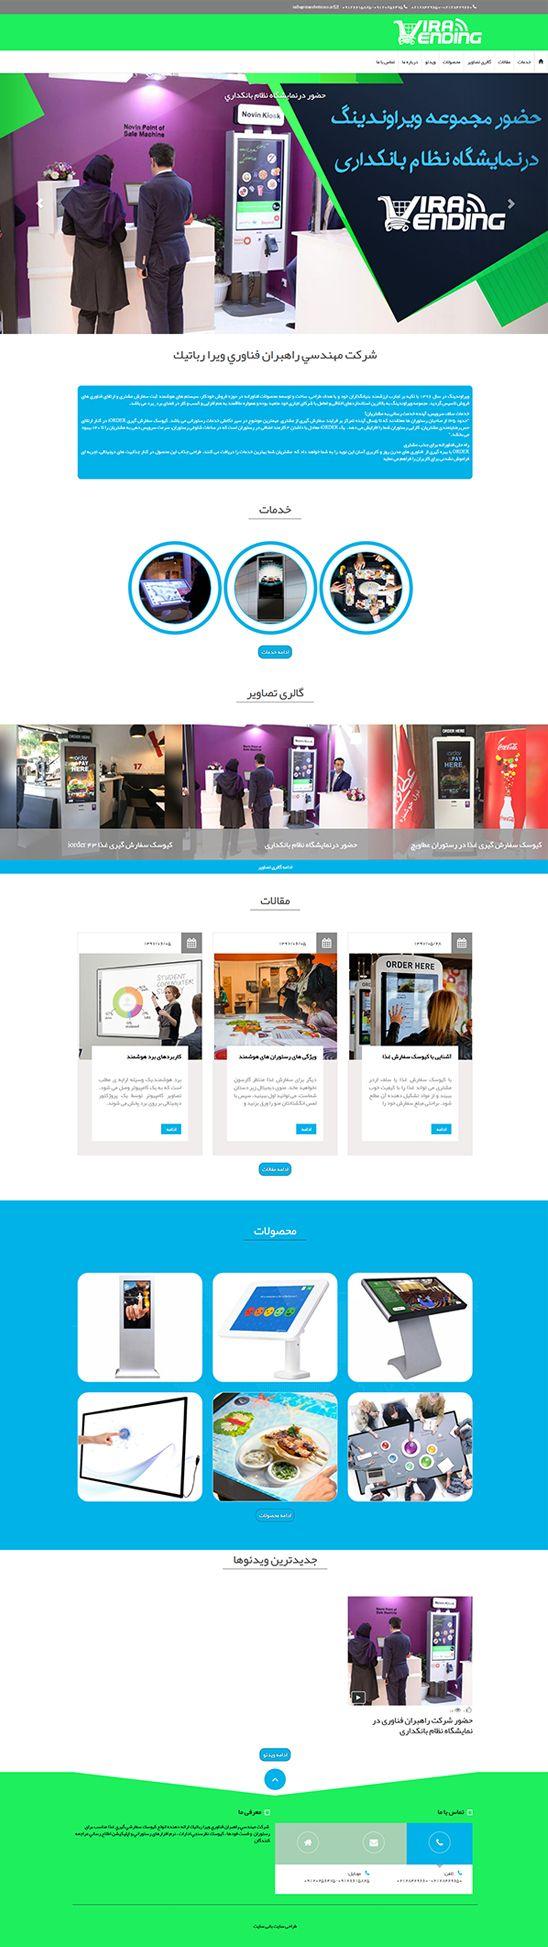 طراحی سایت فناوري ويرا رباتيك